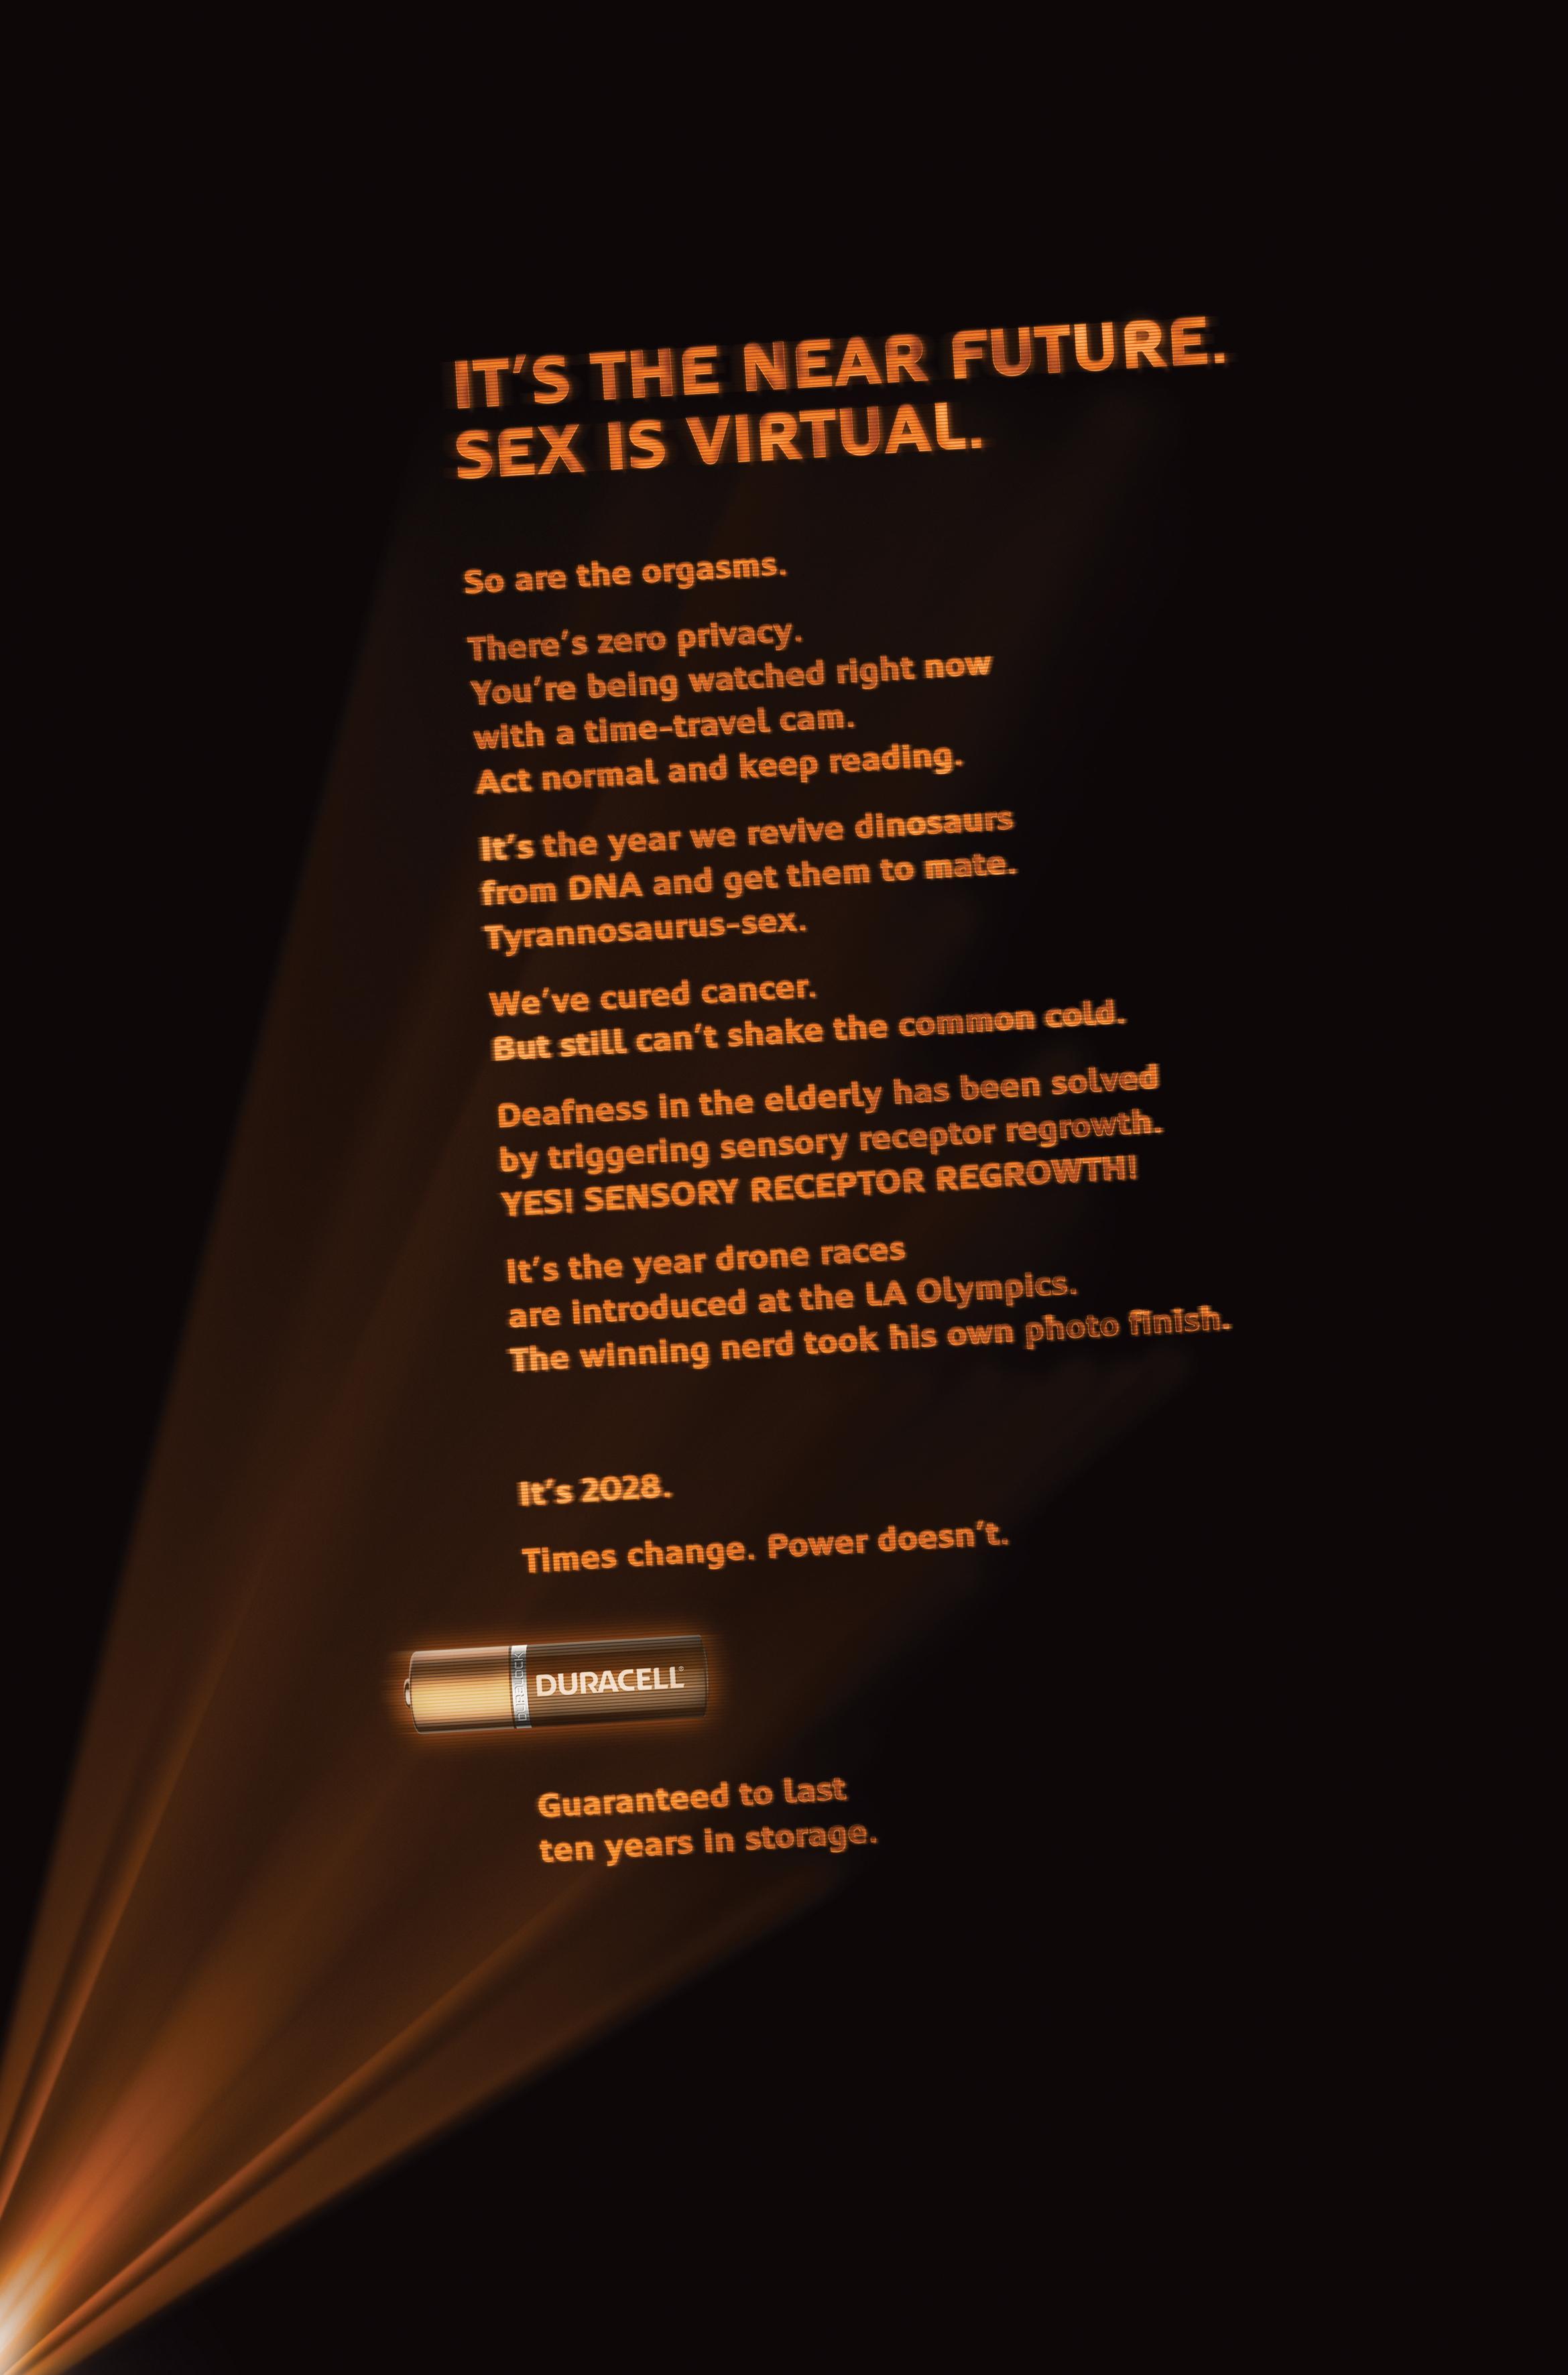 Duracell Print Ad - Sex